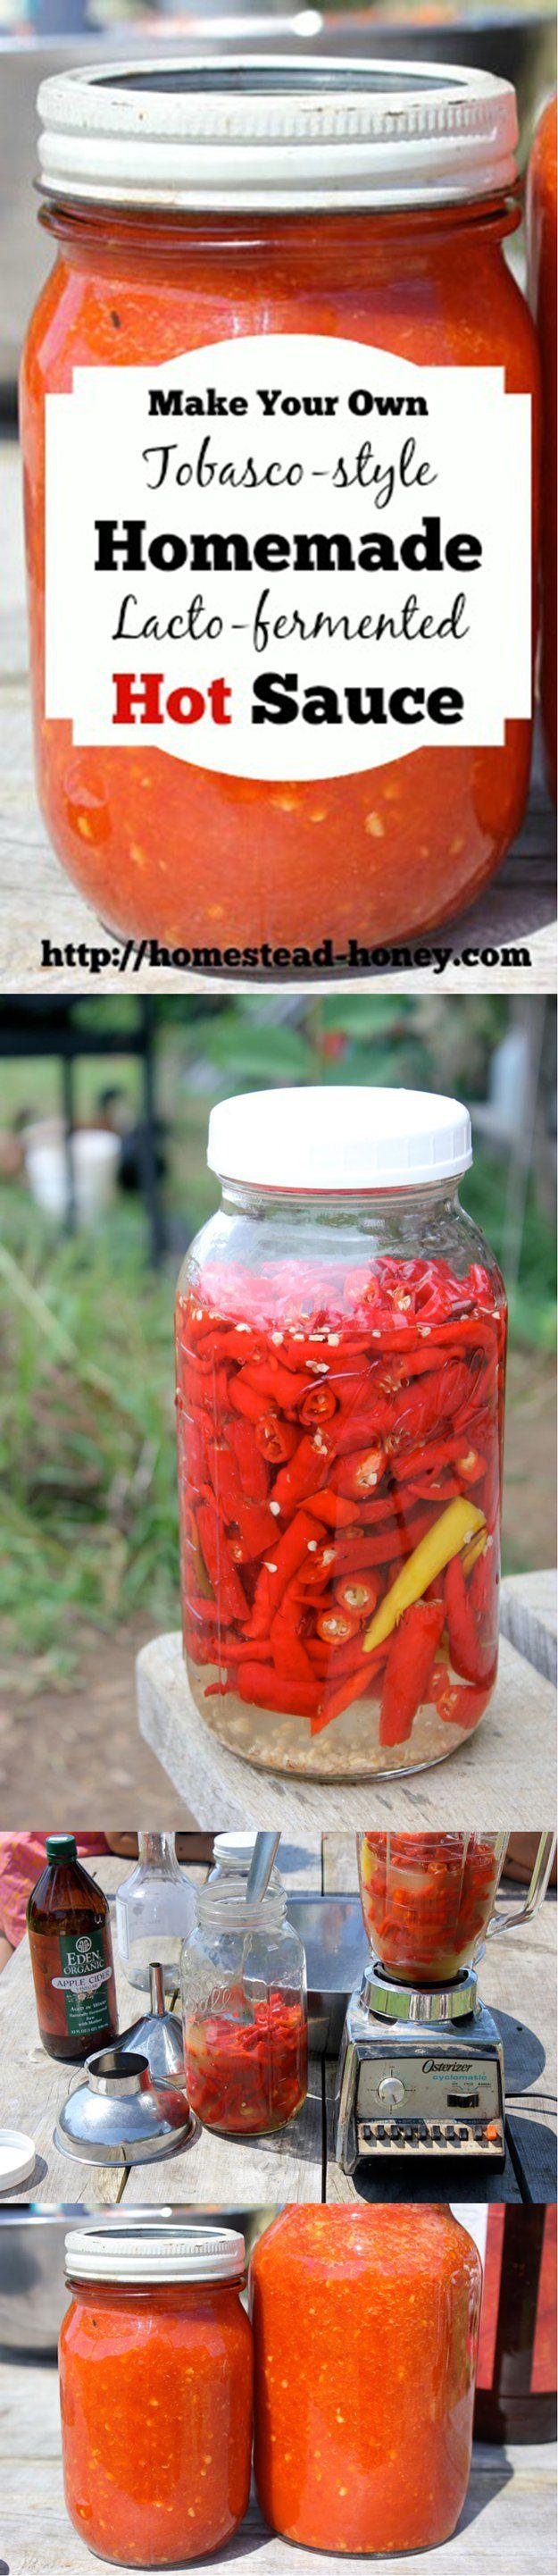 Healthy Homemade Hot Sauce Recipe | https://diyprojects.com/top-14-hot-sauce-recipes/